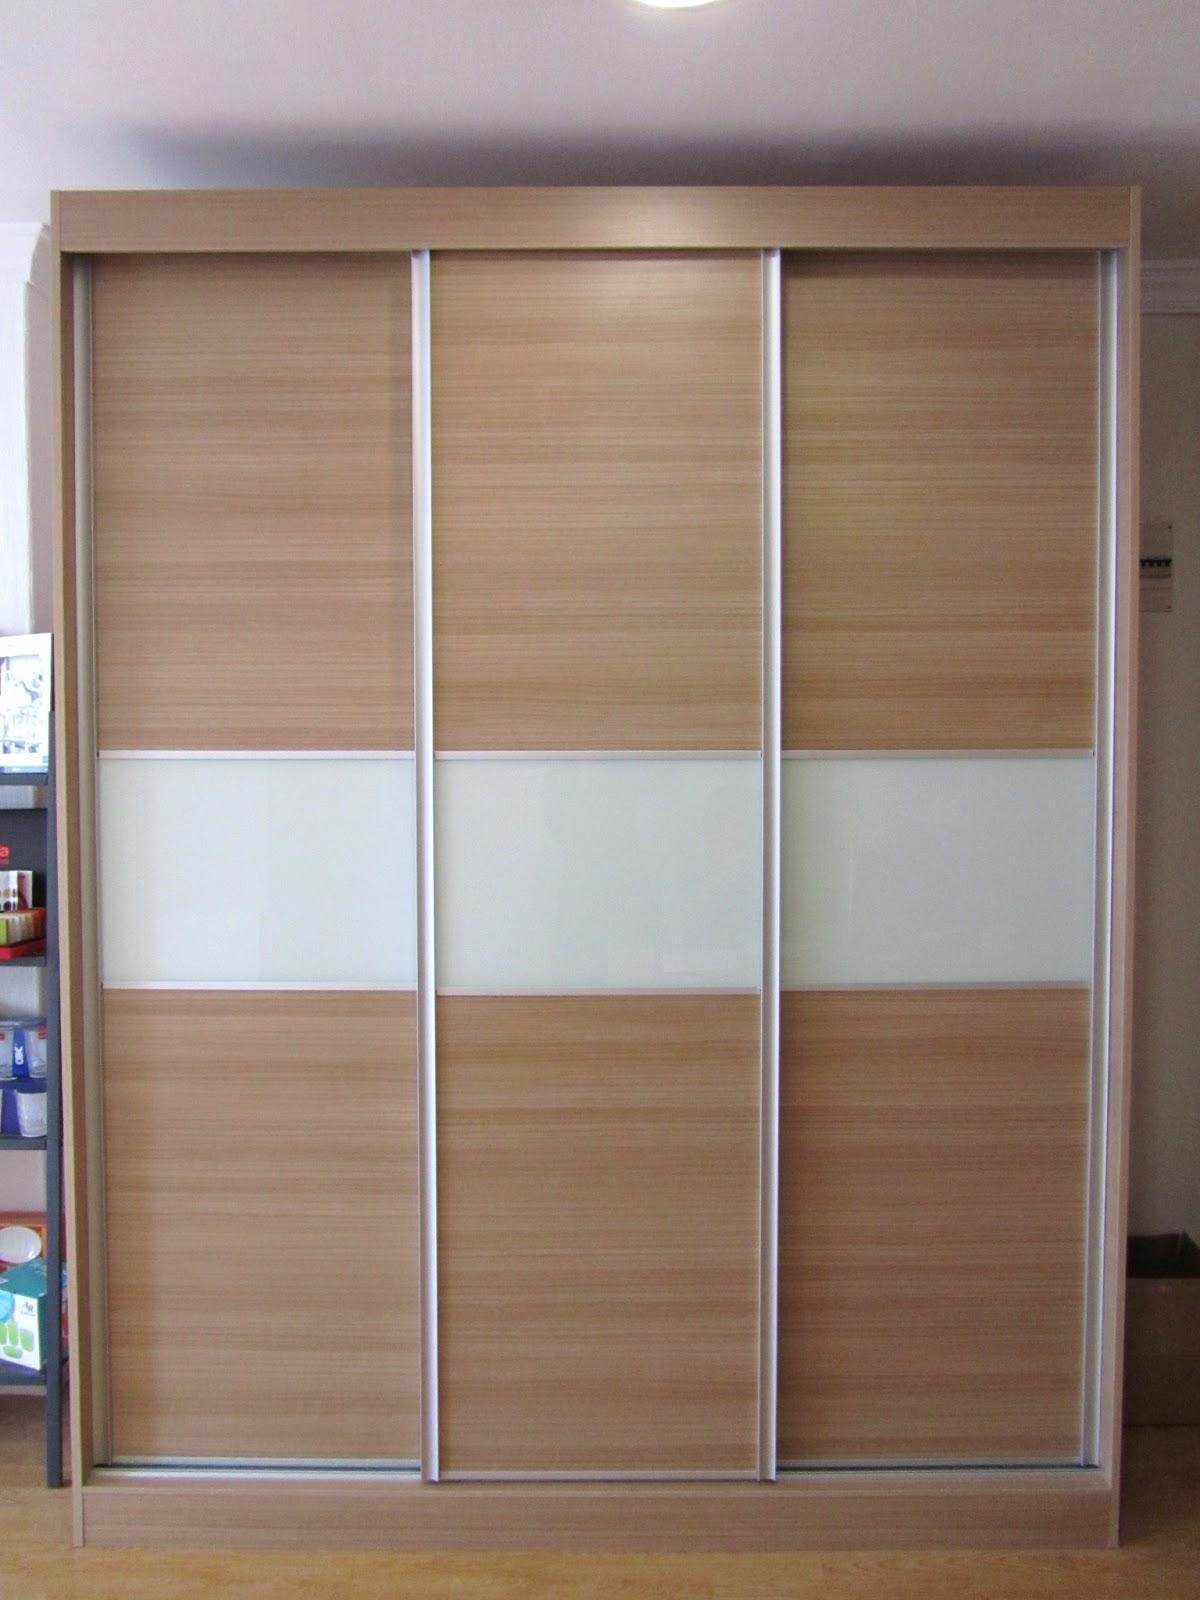 Puertas cocina baratas good buffet blanco puertas for Puertas de armarios de cocina baratas